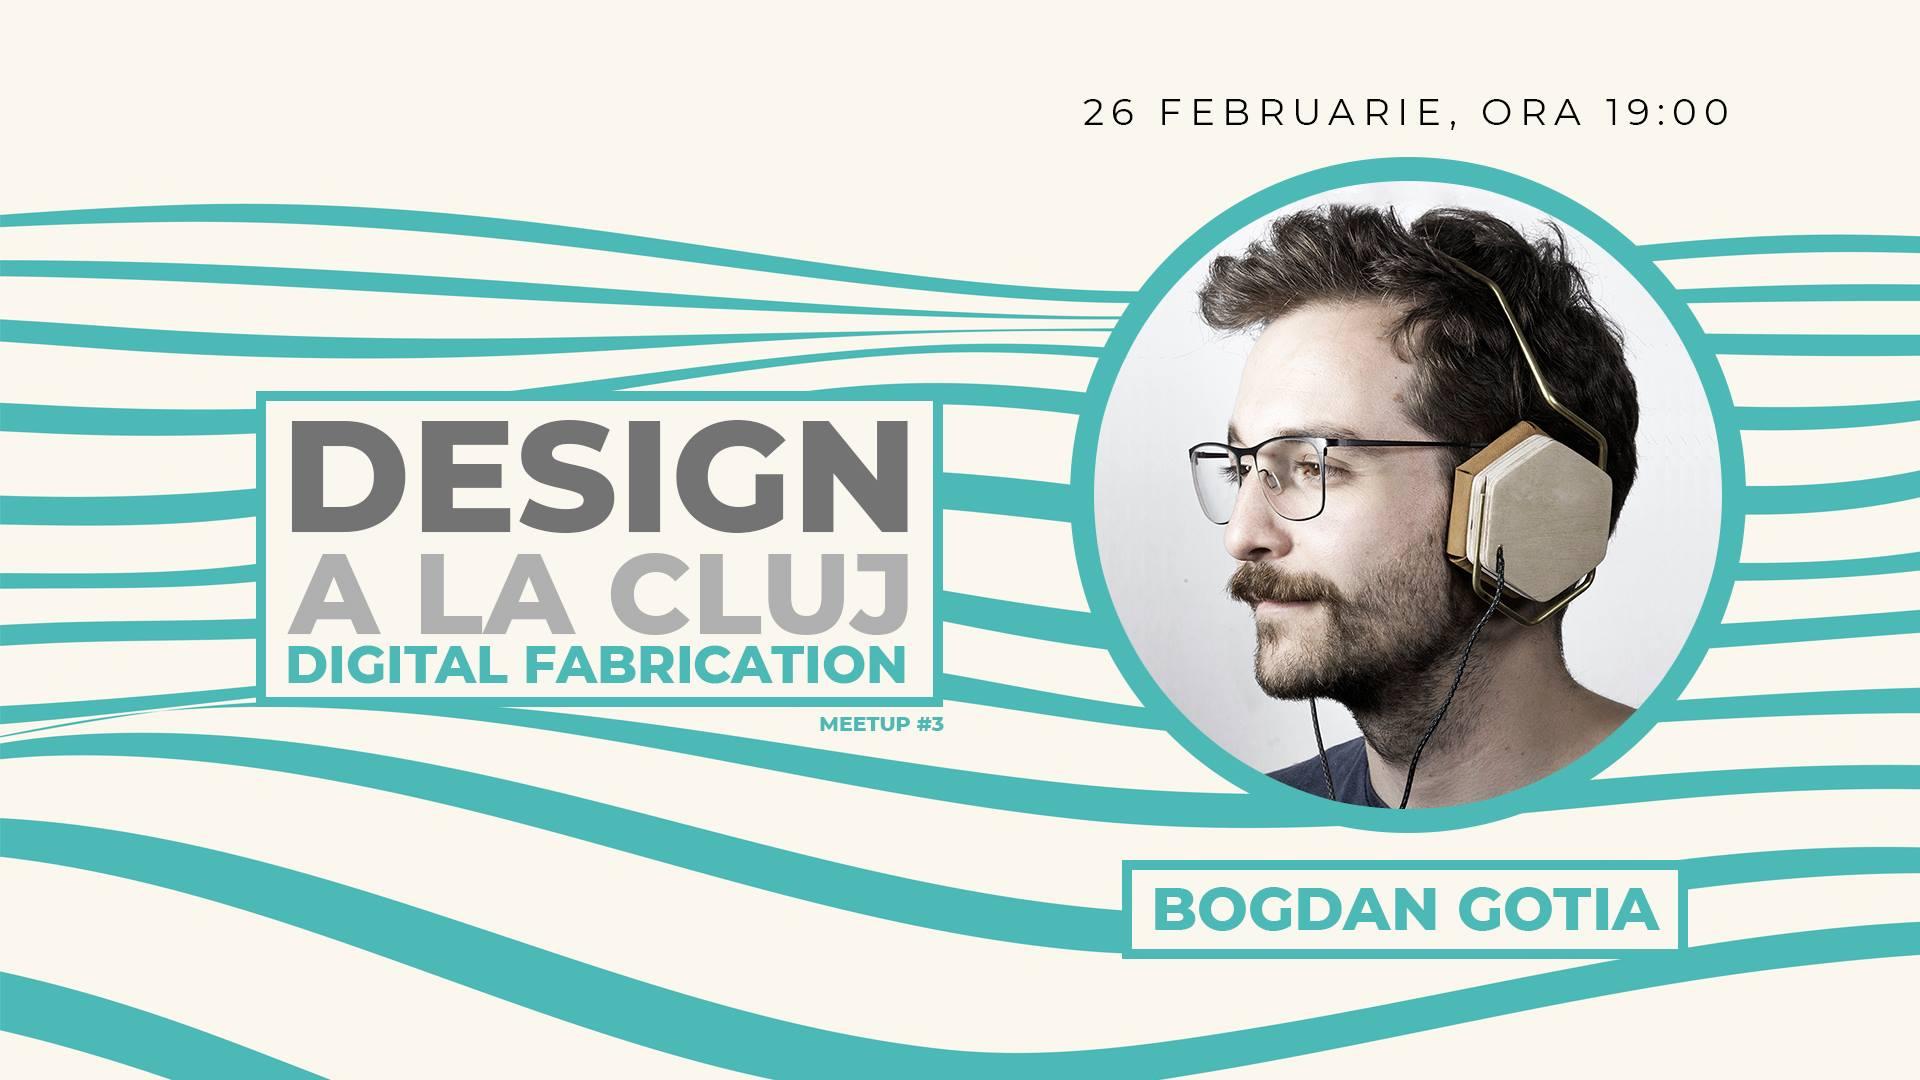 Design a la Cluj meetup #3 | Digital Fabrication